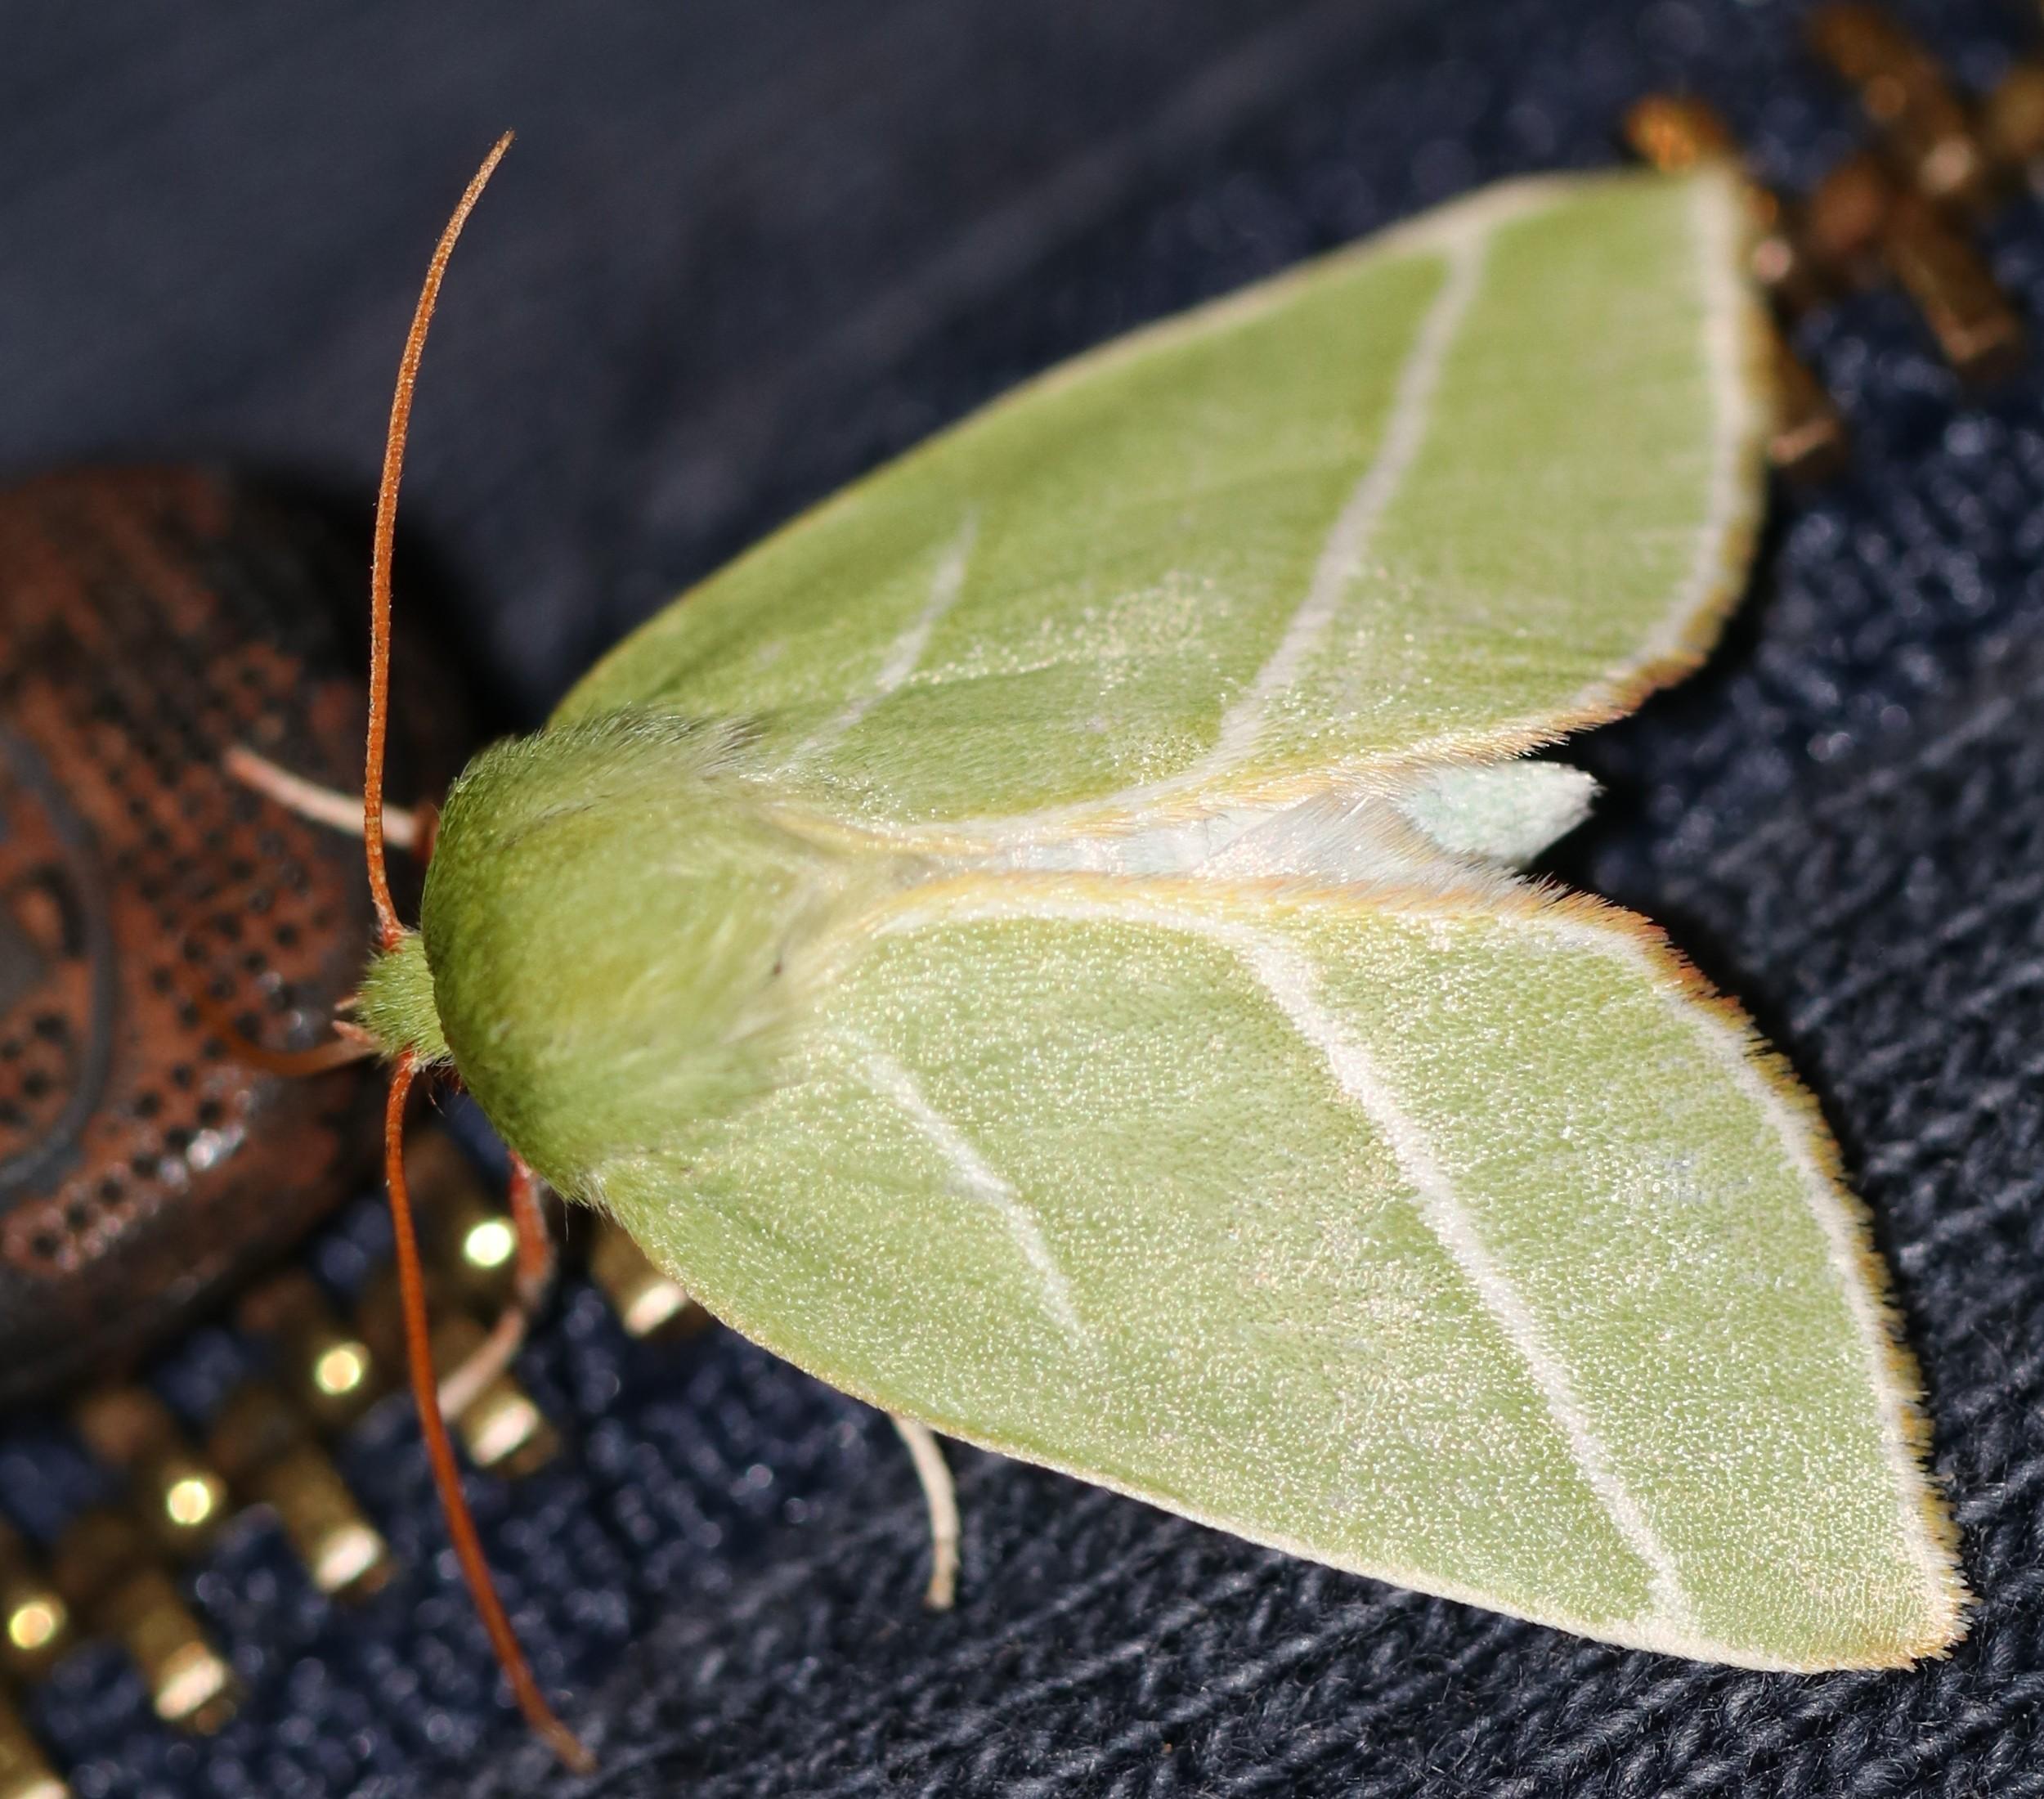 Pseudoips prasinanus